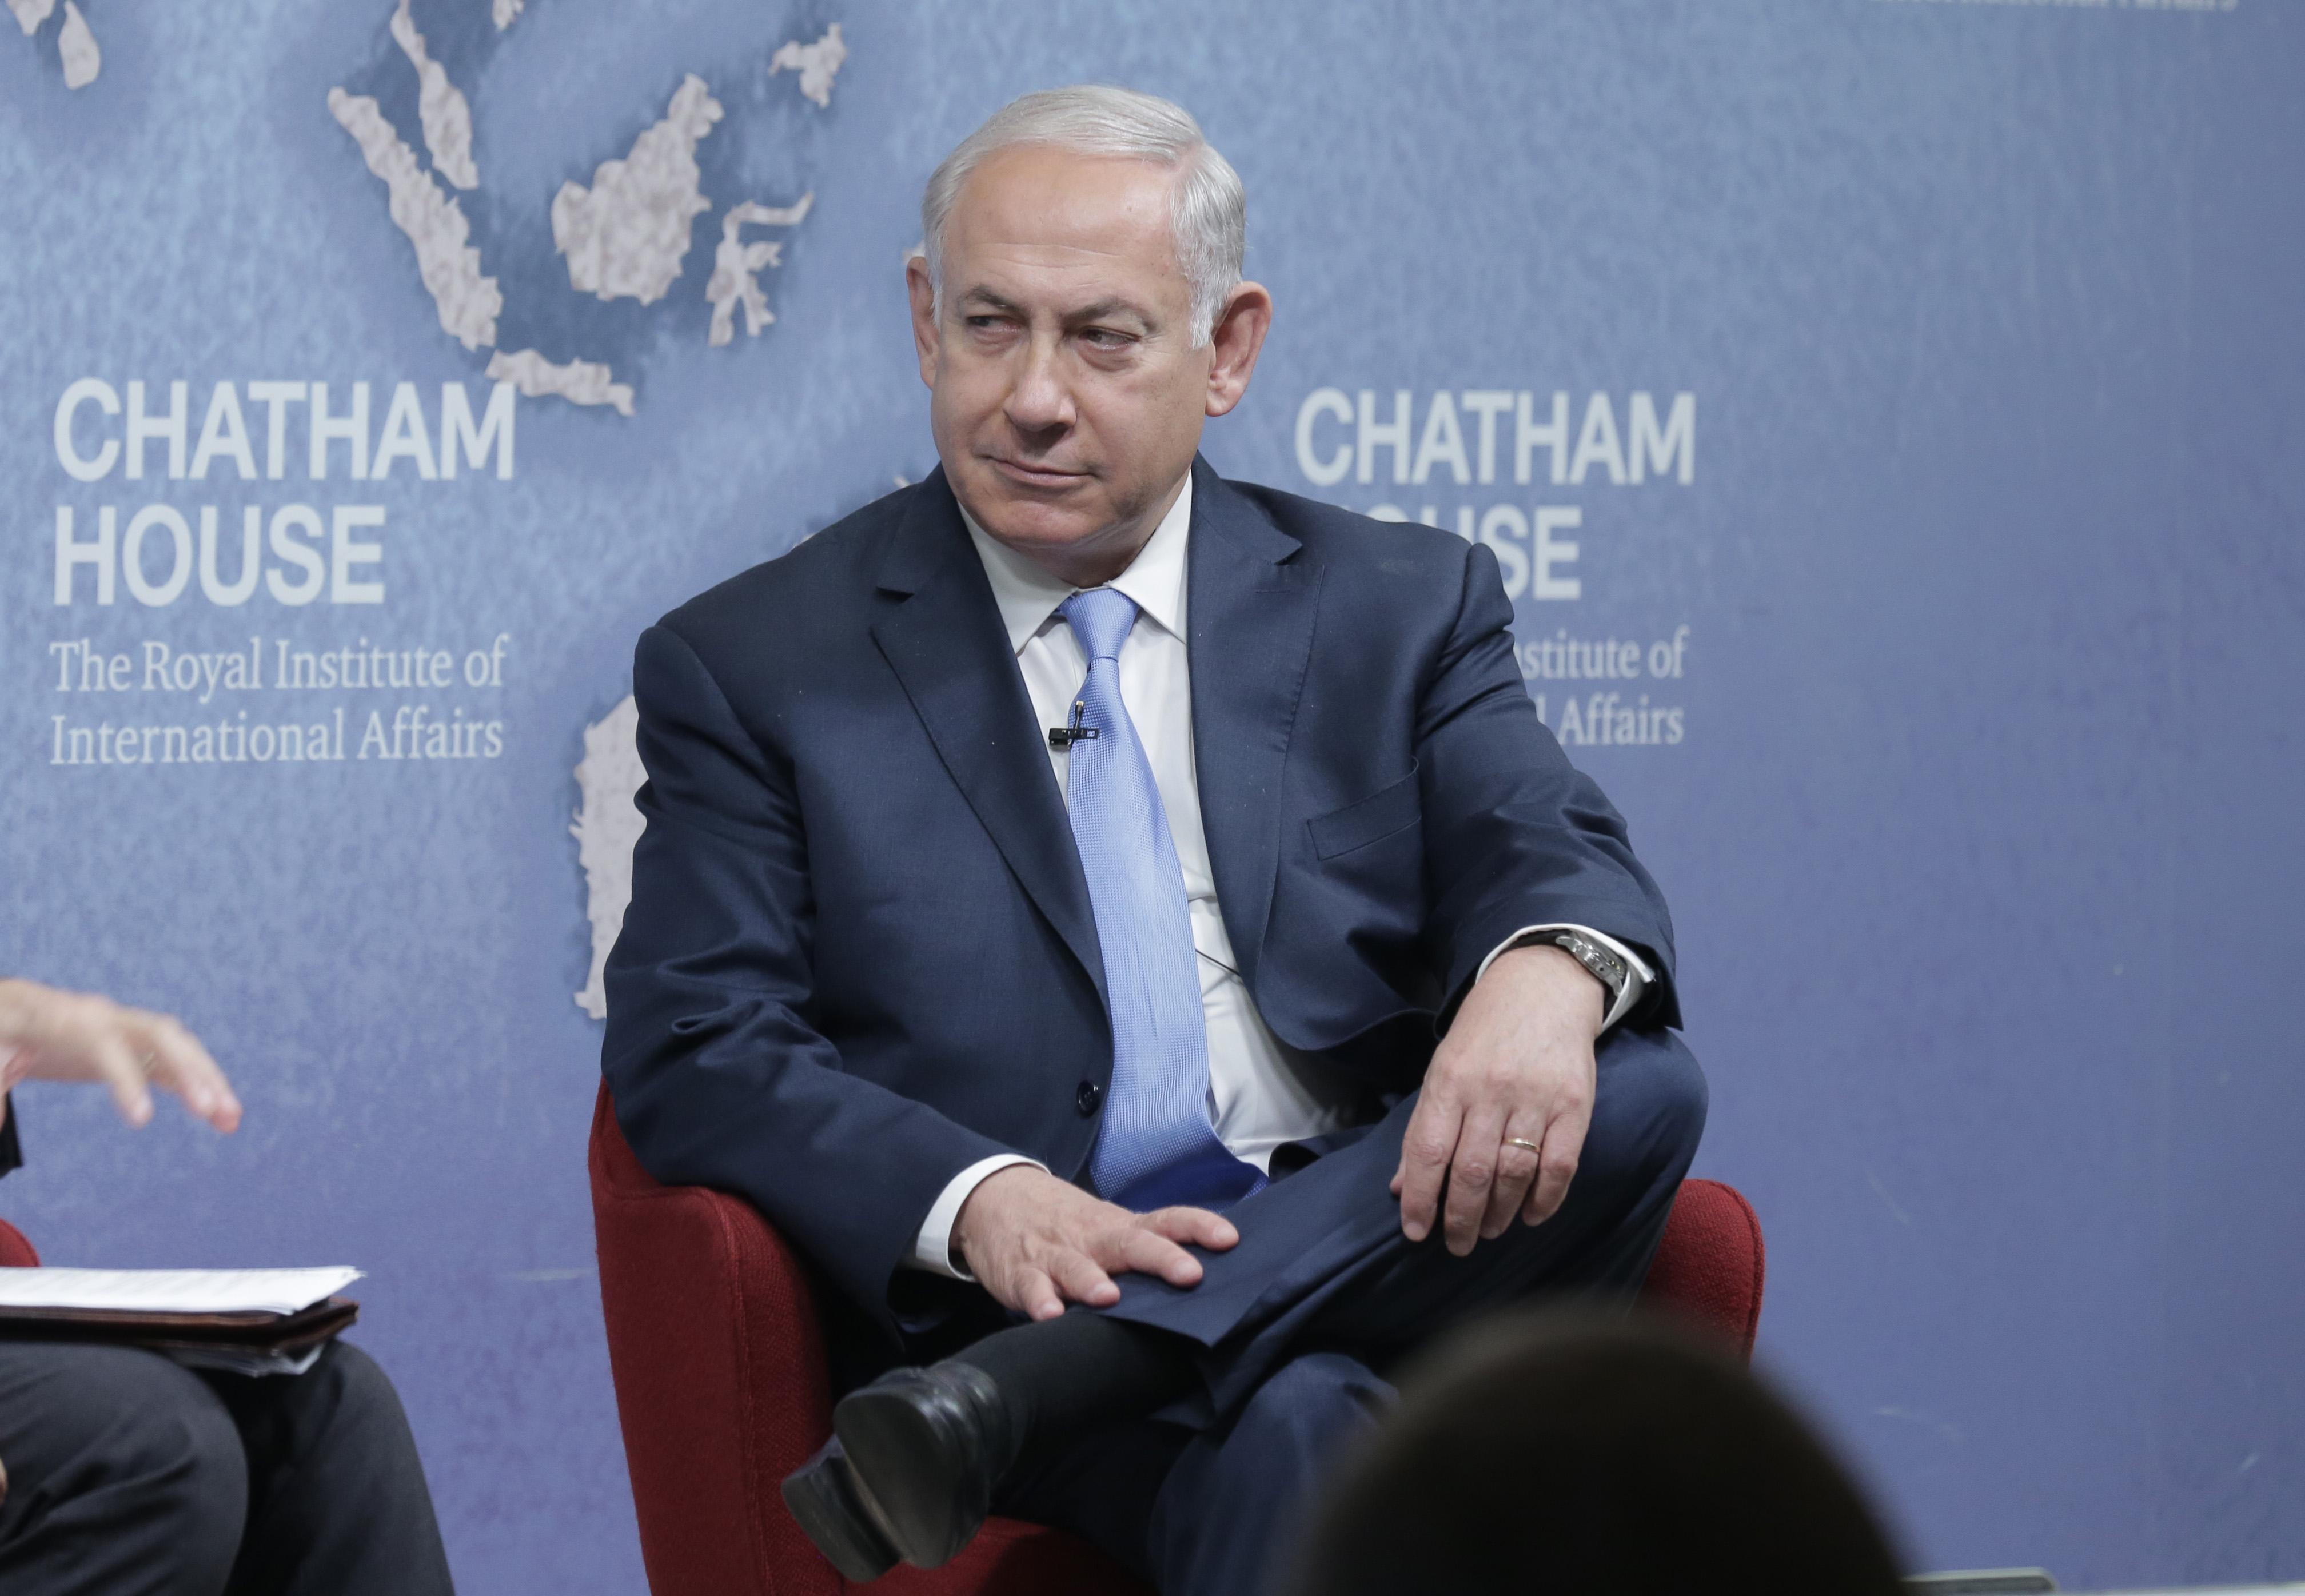 File:Benjamin Netanyahu, Prime Minister, State of Israel (26364690219).jpg  - Wikimedia Commons